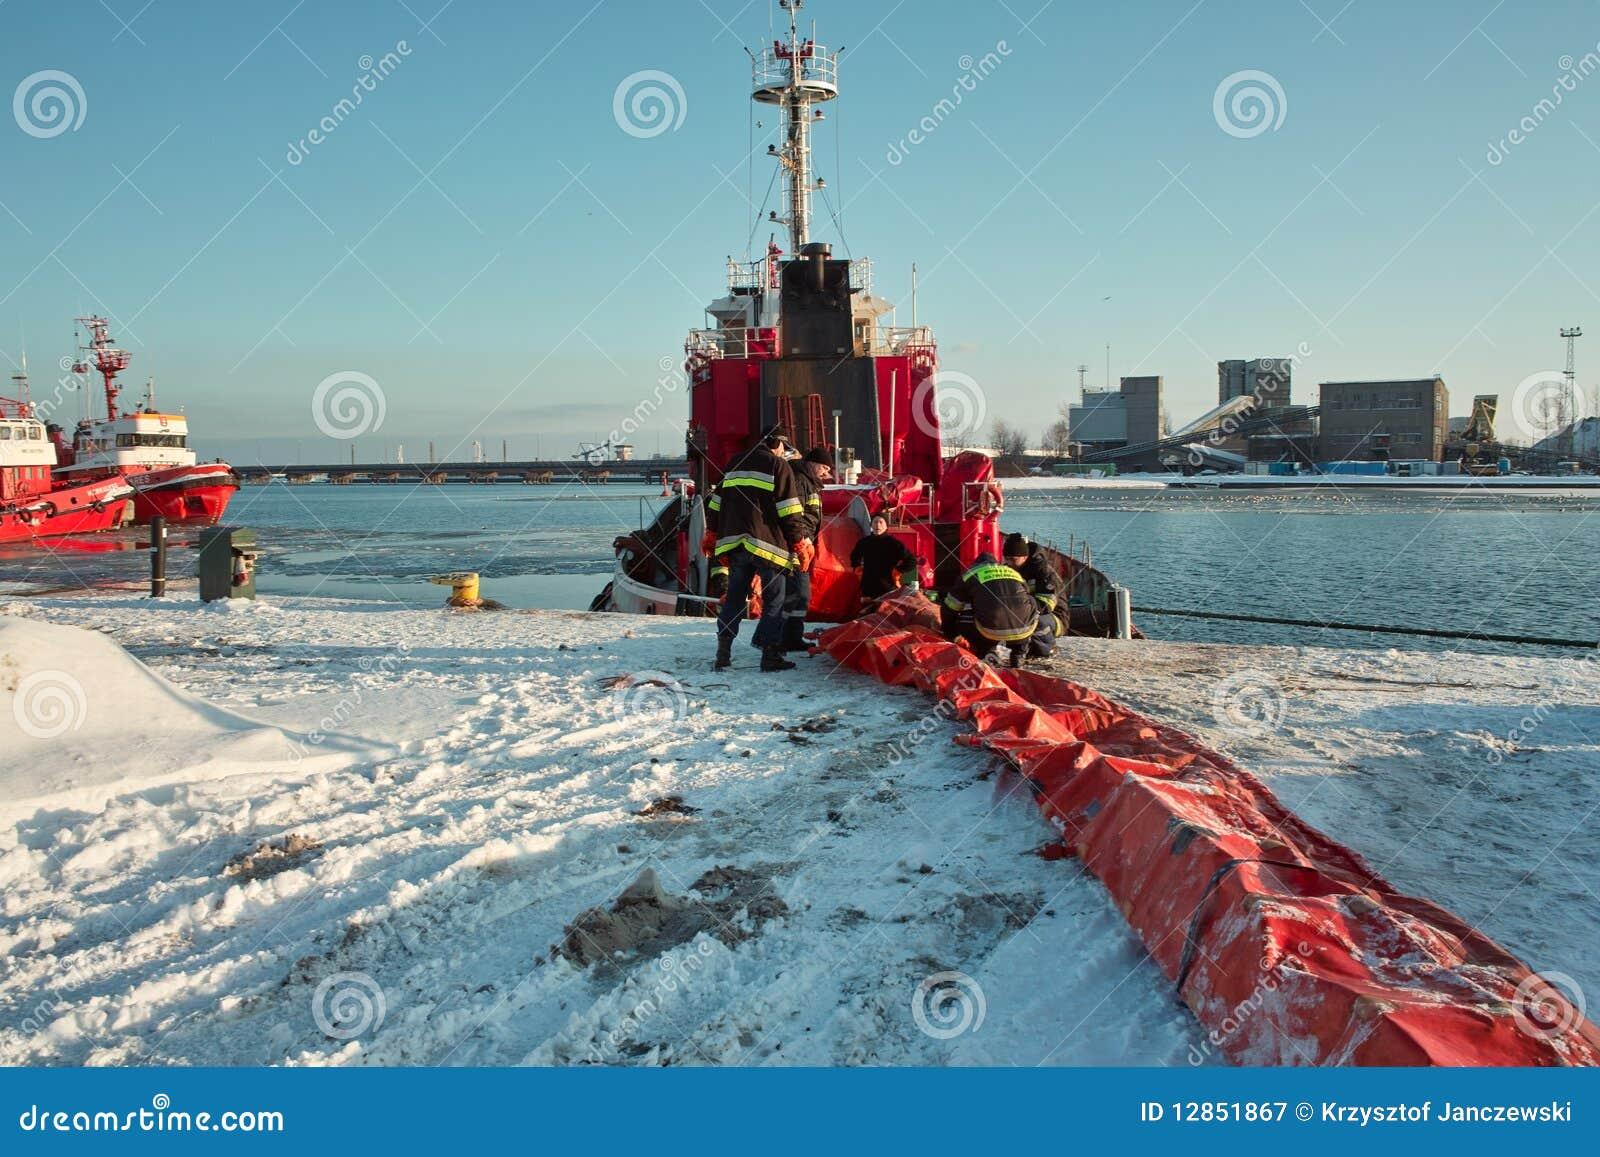 Marine Firefighter Job. Editorial Photography - Image: 12851867